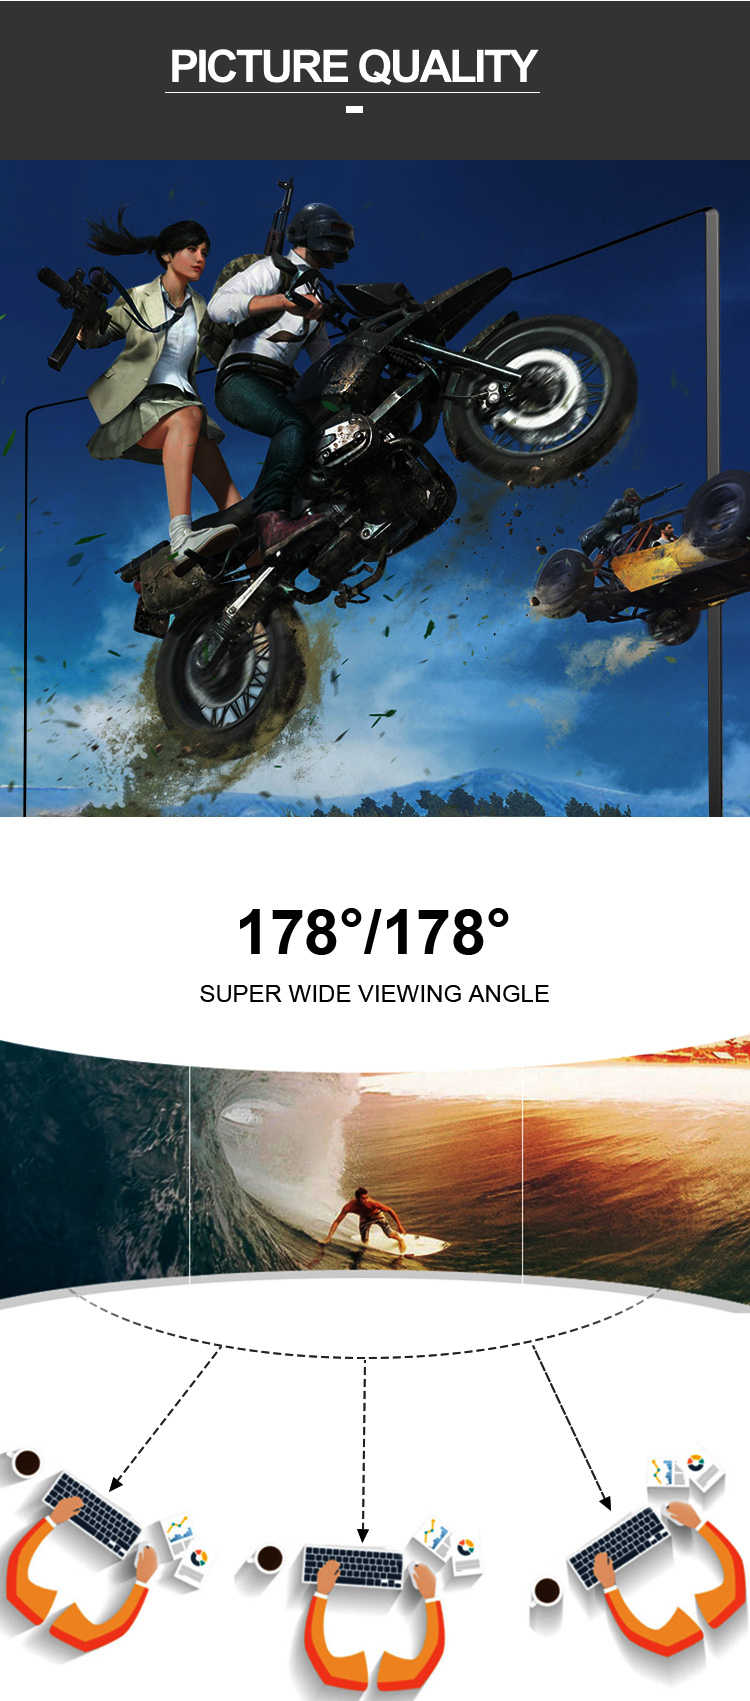 de11-11